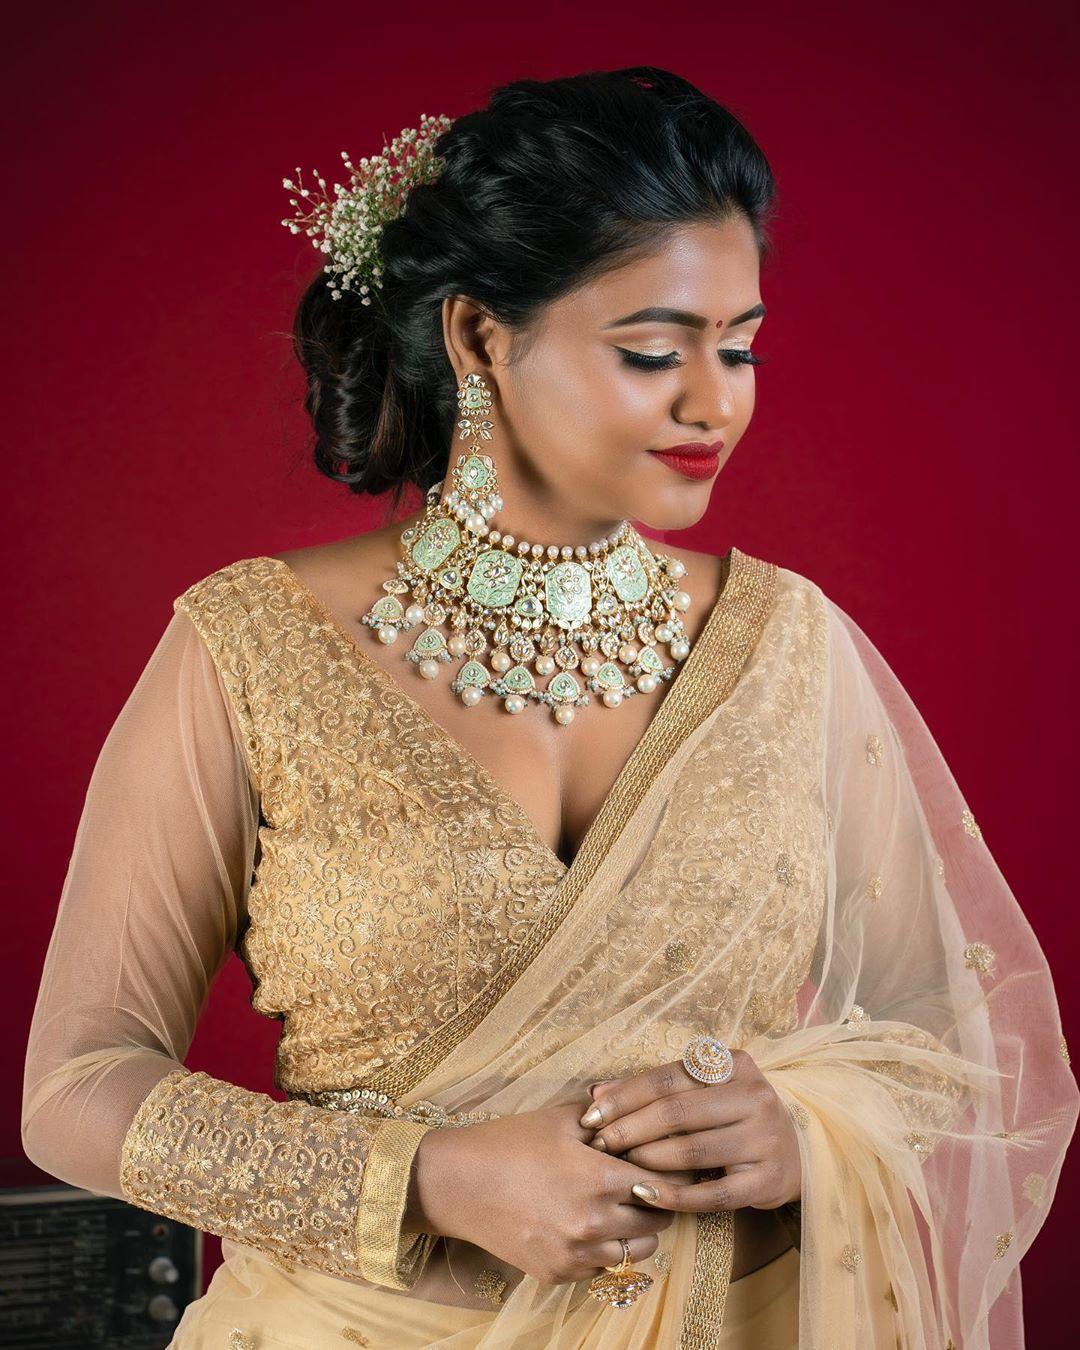 actress shalu shamu instagram